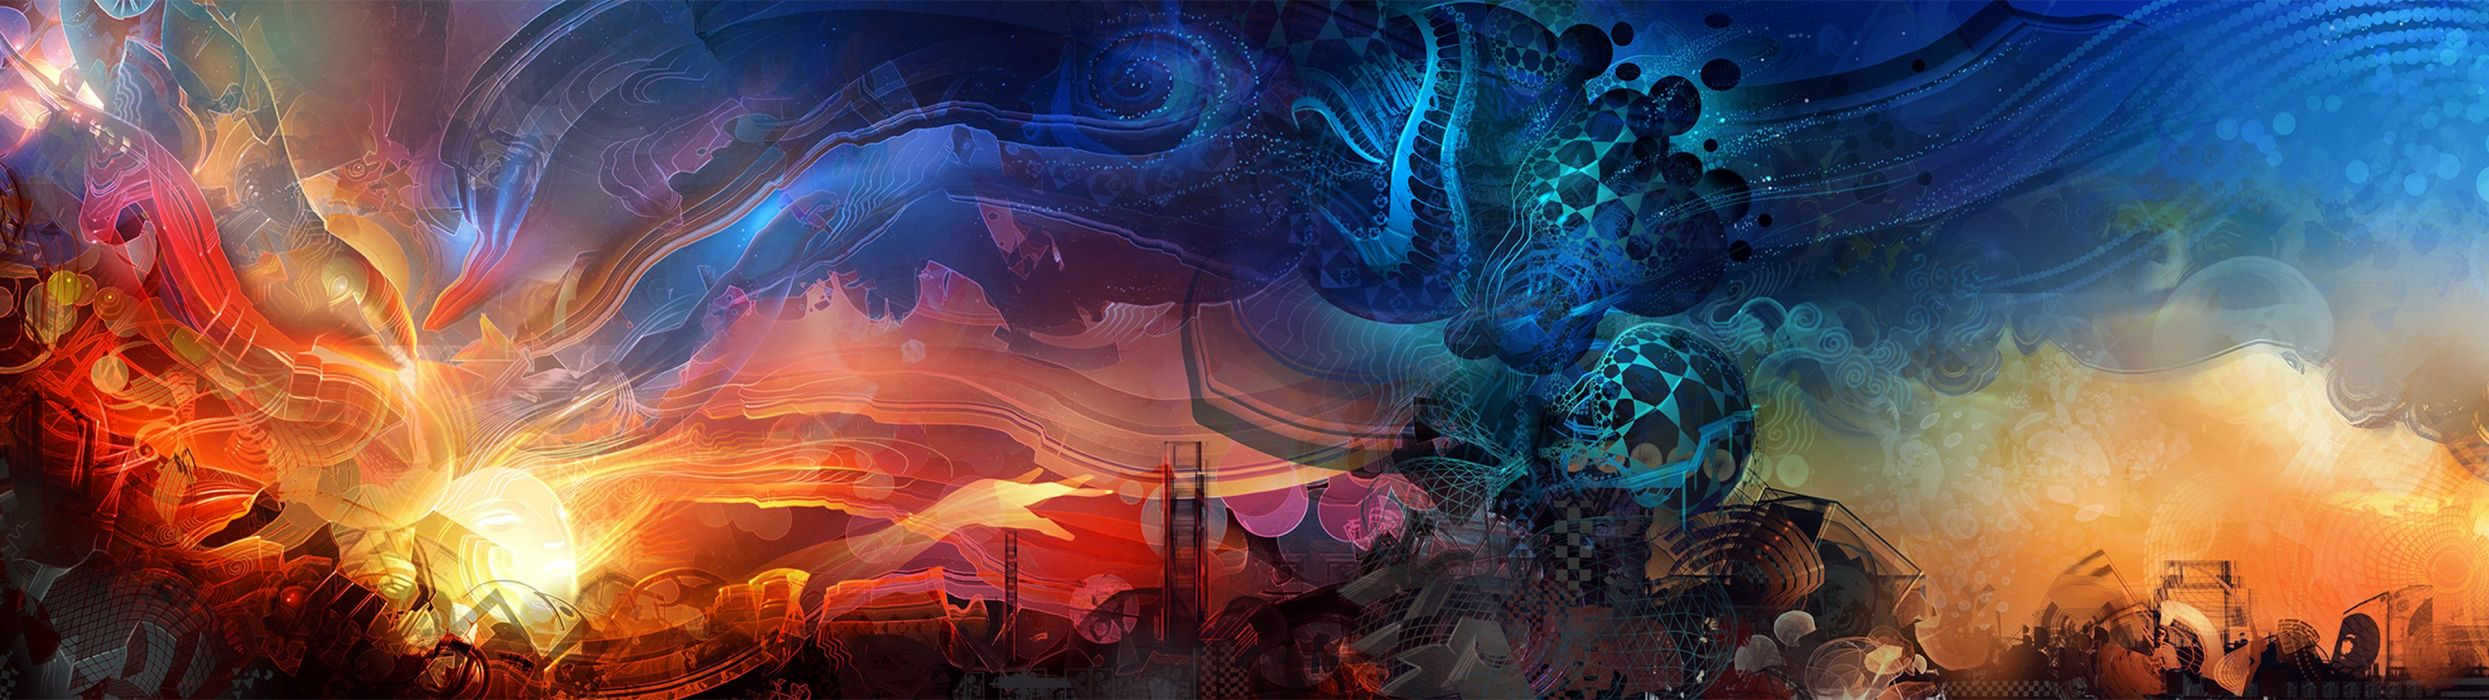 art artwork fantasy original wallpapers background (23) wallpaper